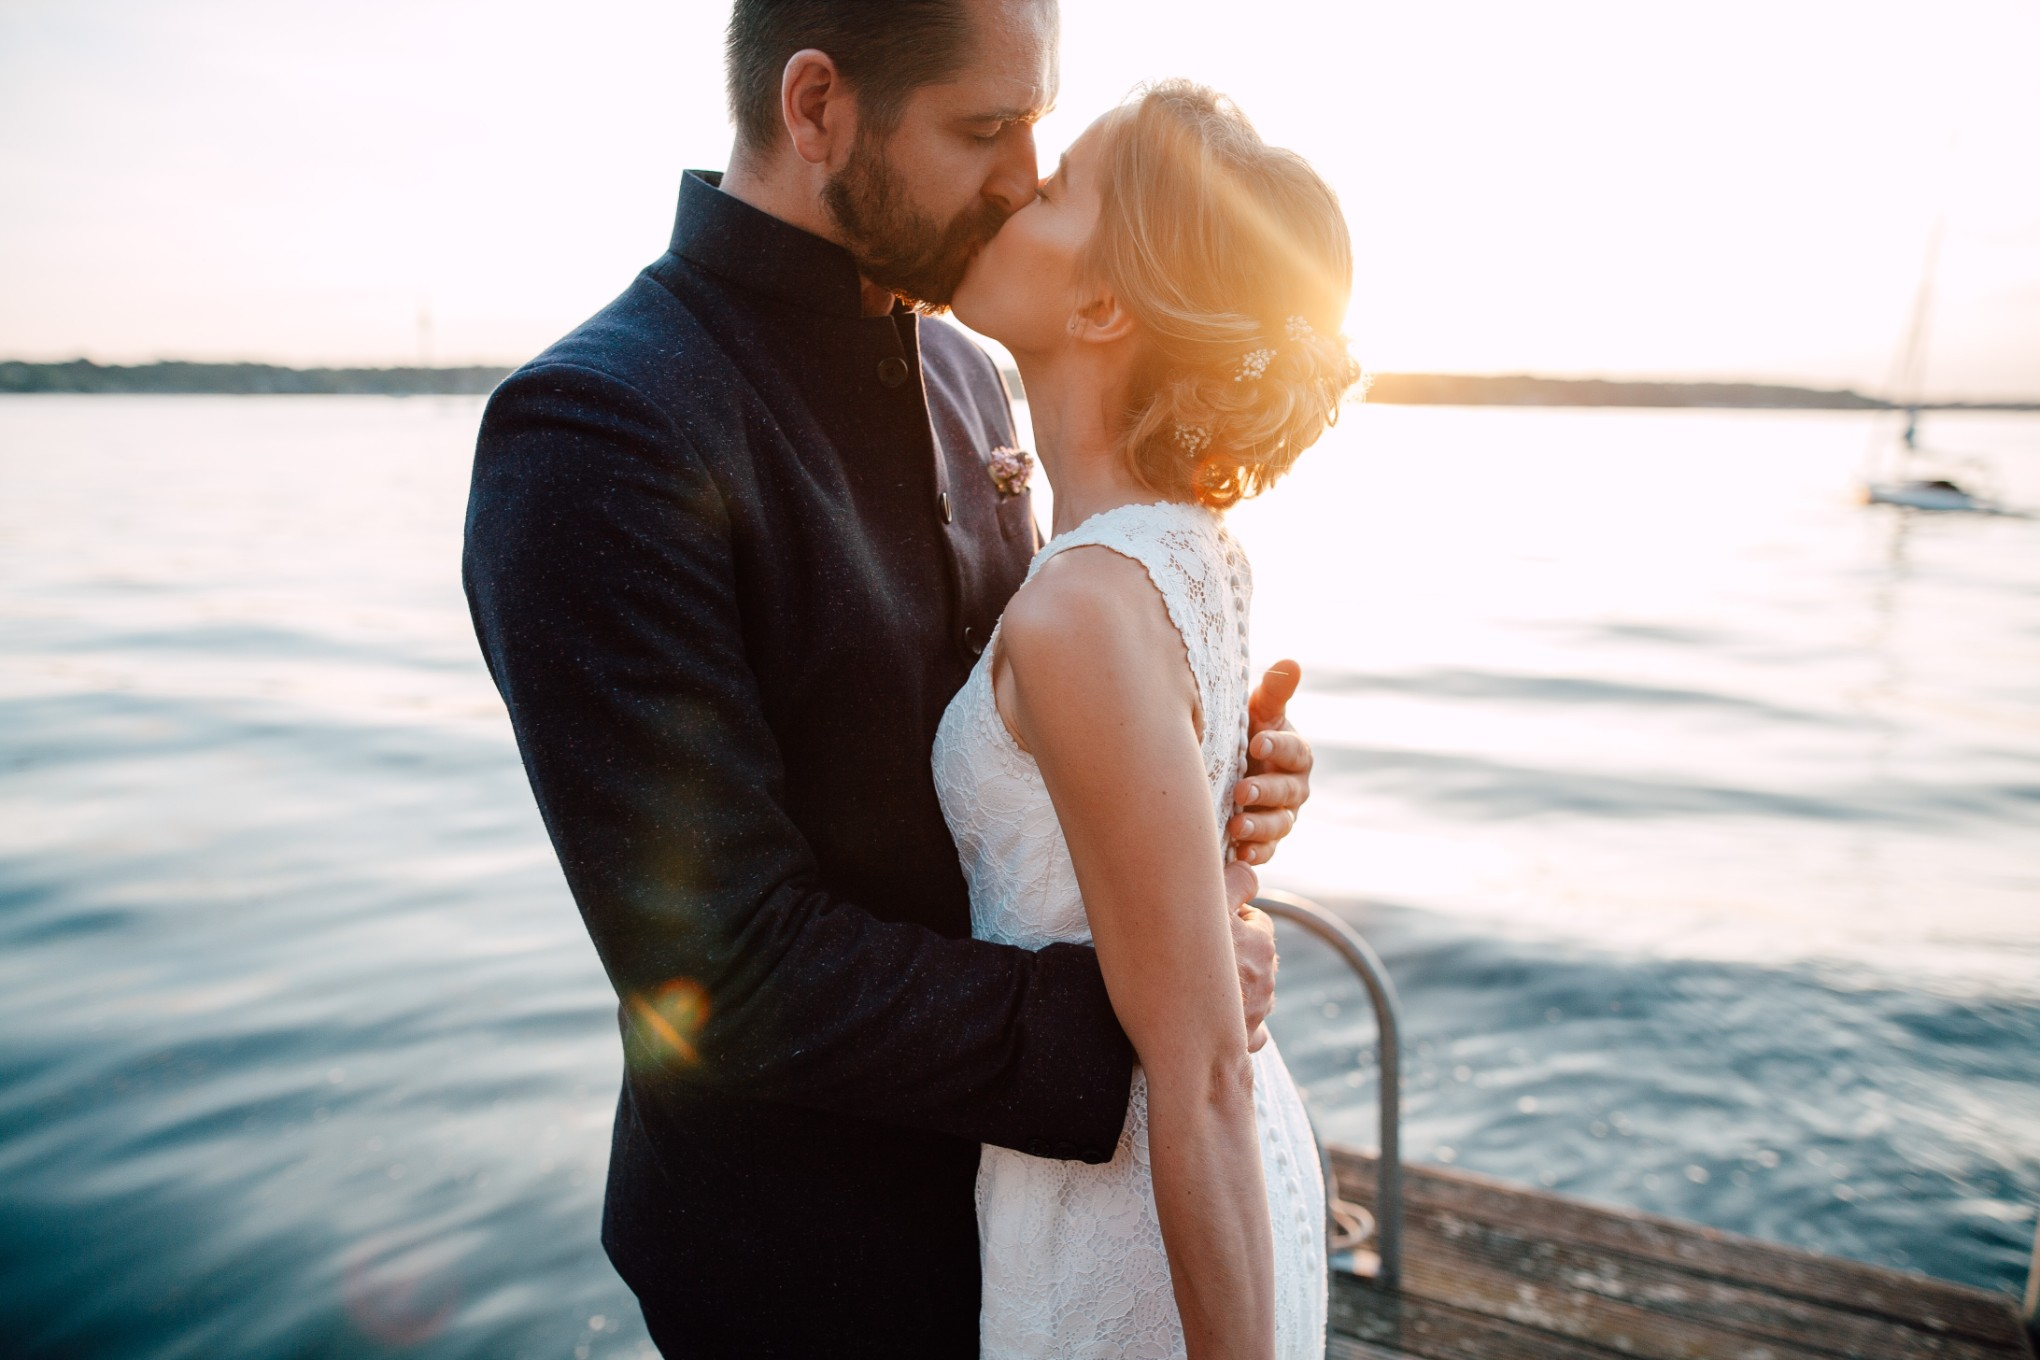 Berlin-Wannsee-Pia-Anna-Christian-Wedding-Photography-ST-78.jpg